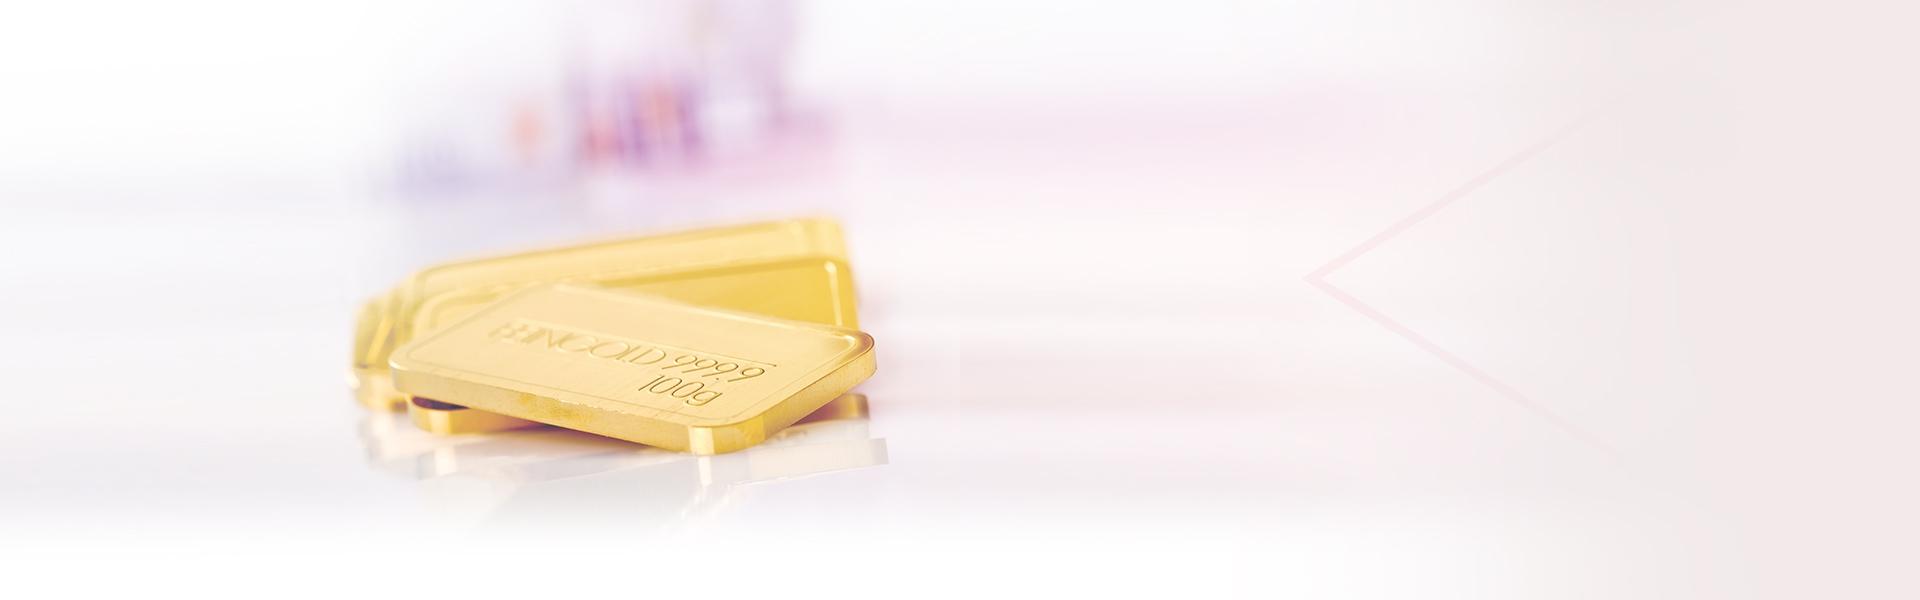 Sell Gold Hoboken (@pawnshopnjnj1) Cover Image